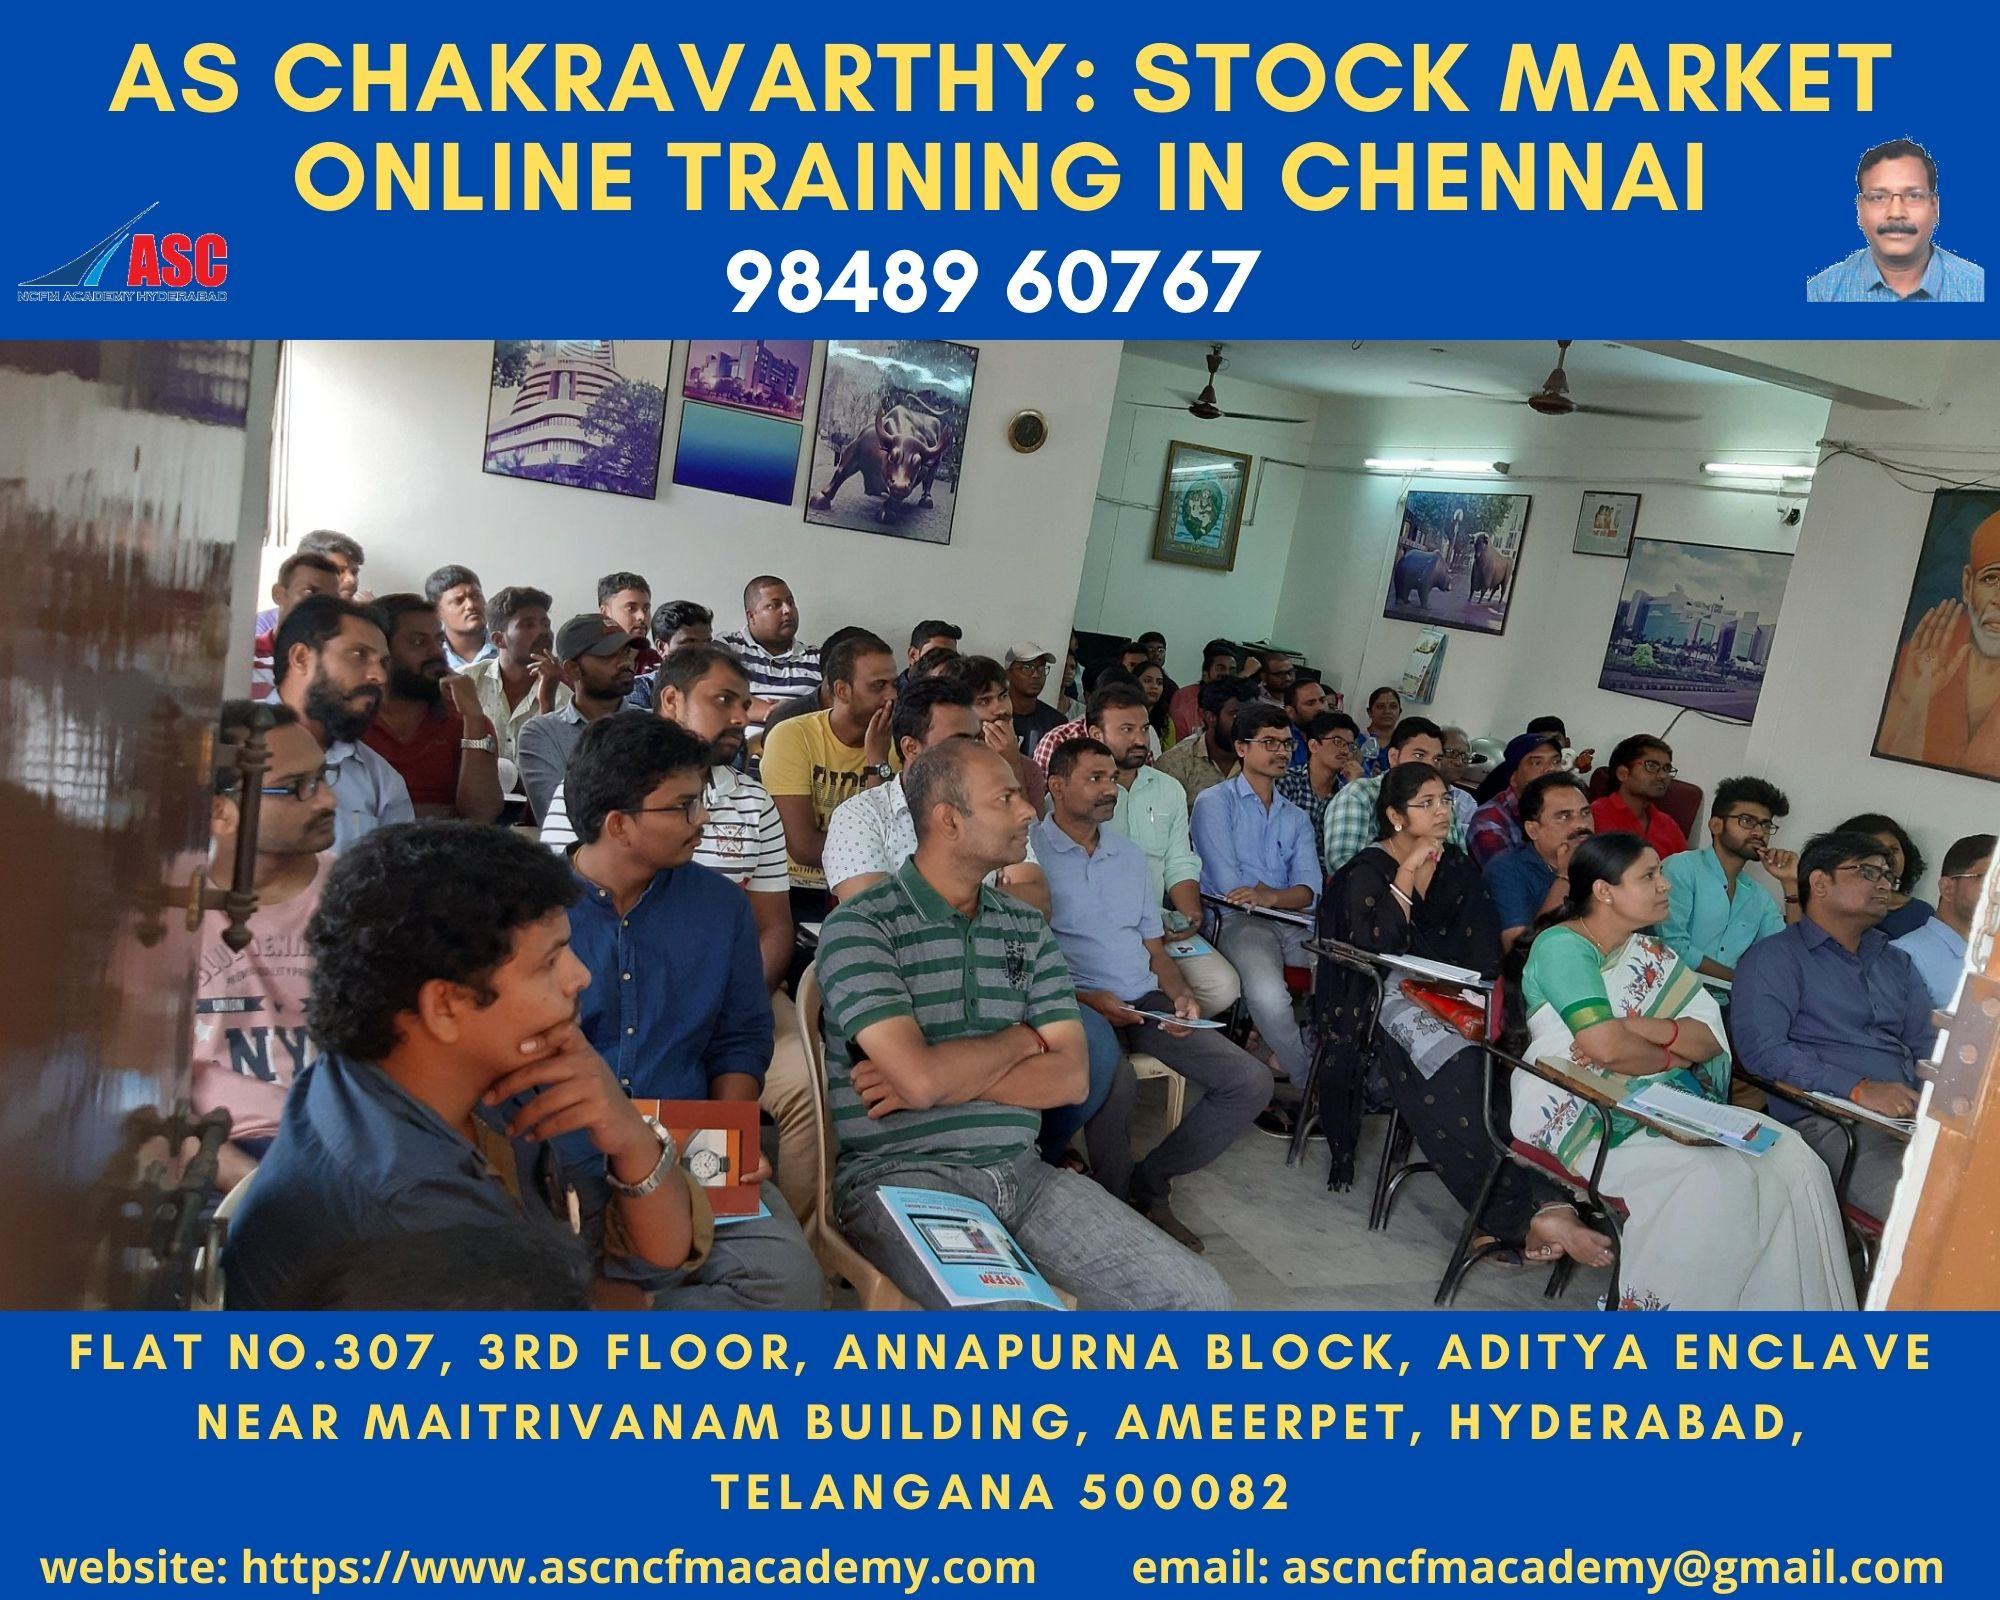 Online Stock Market Technical Training in Telugu Chennai